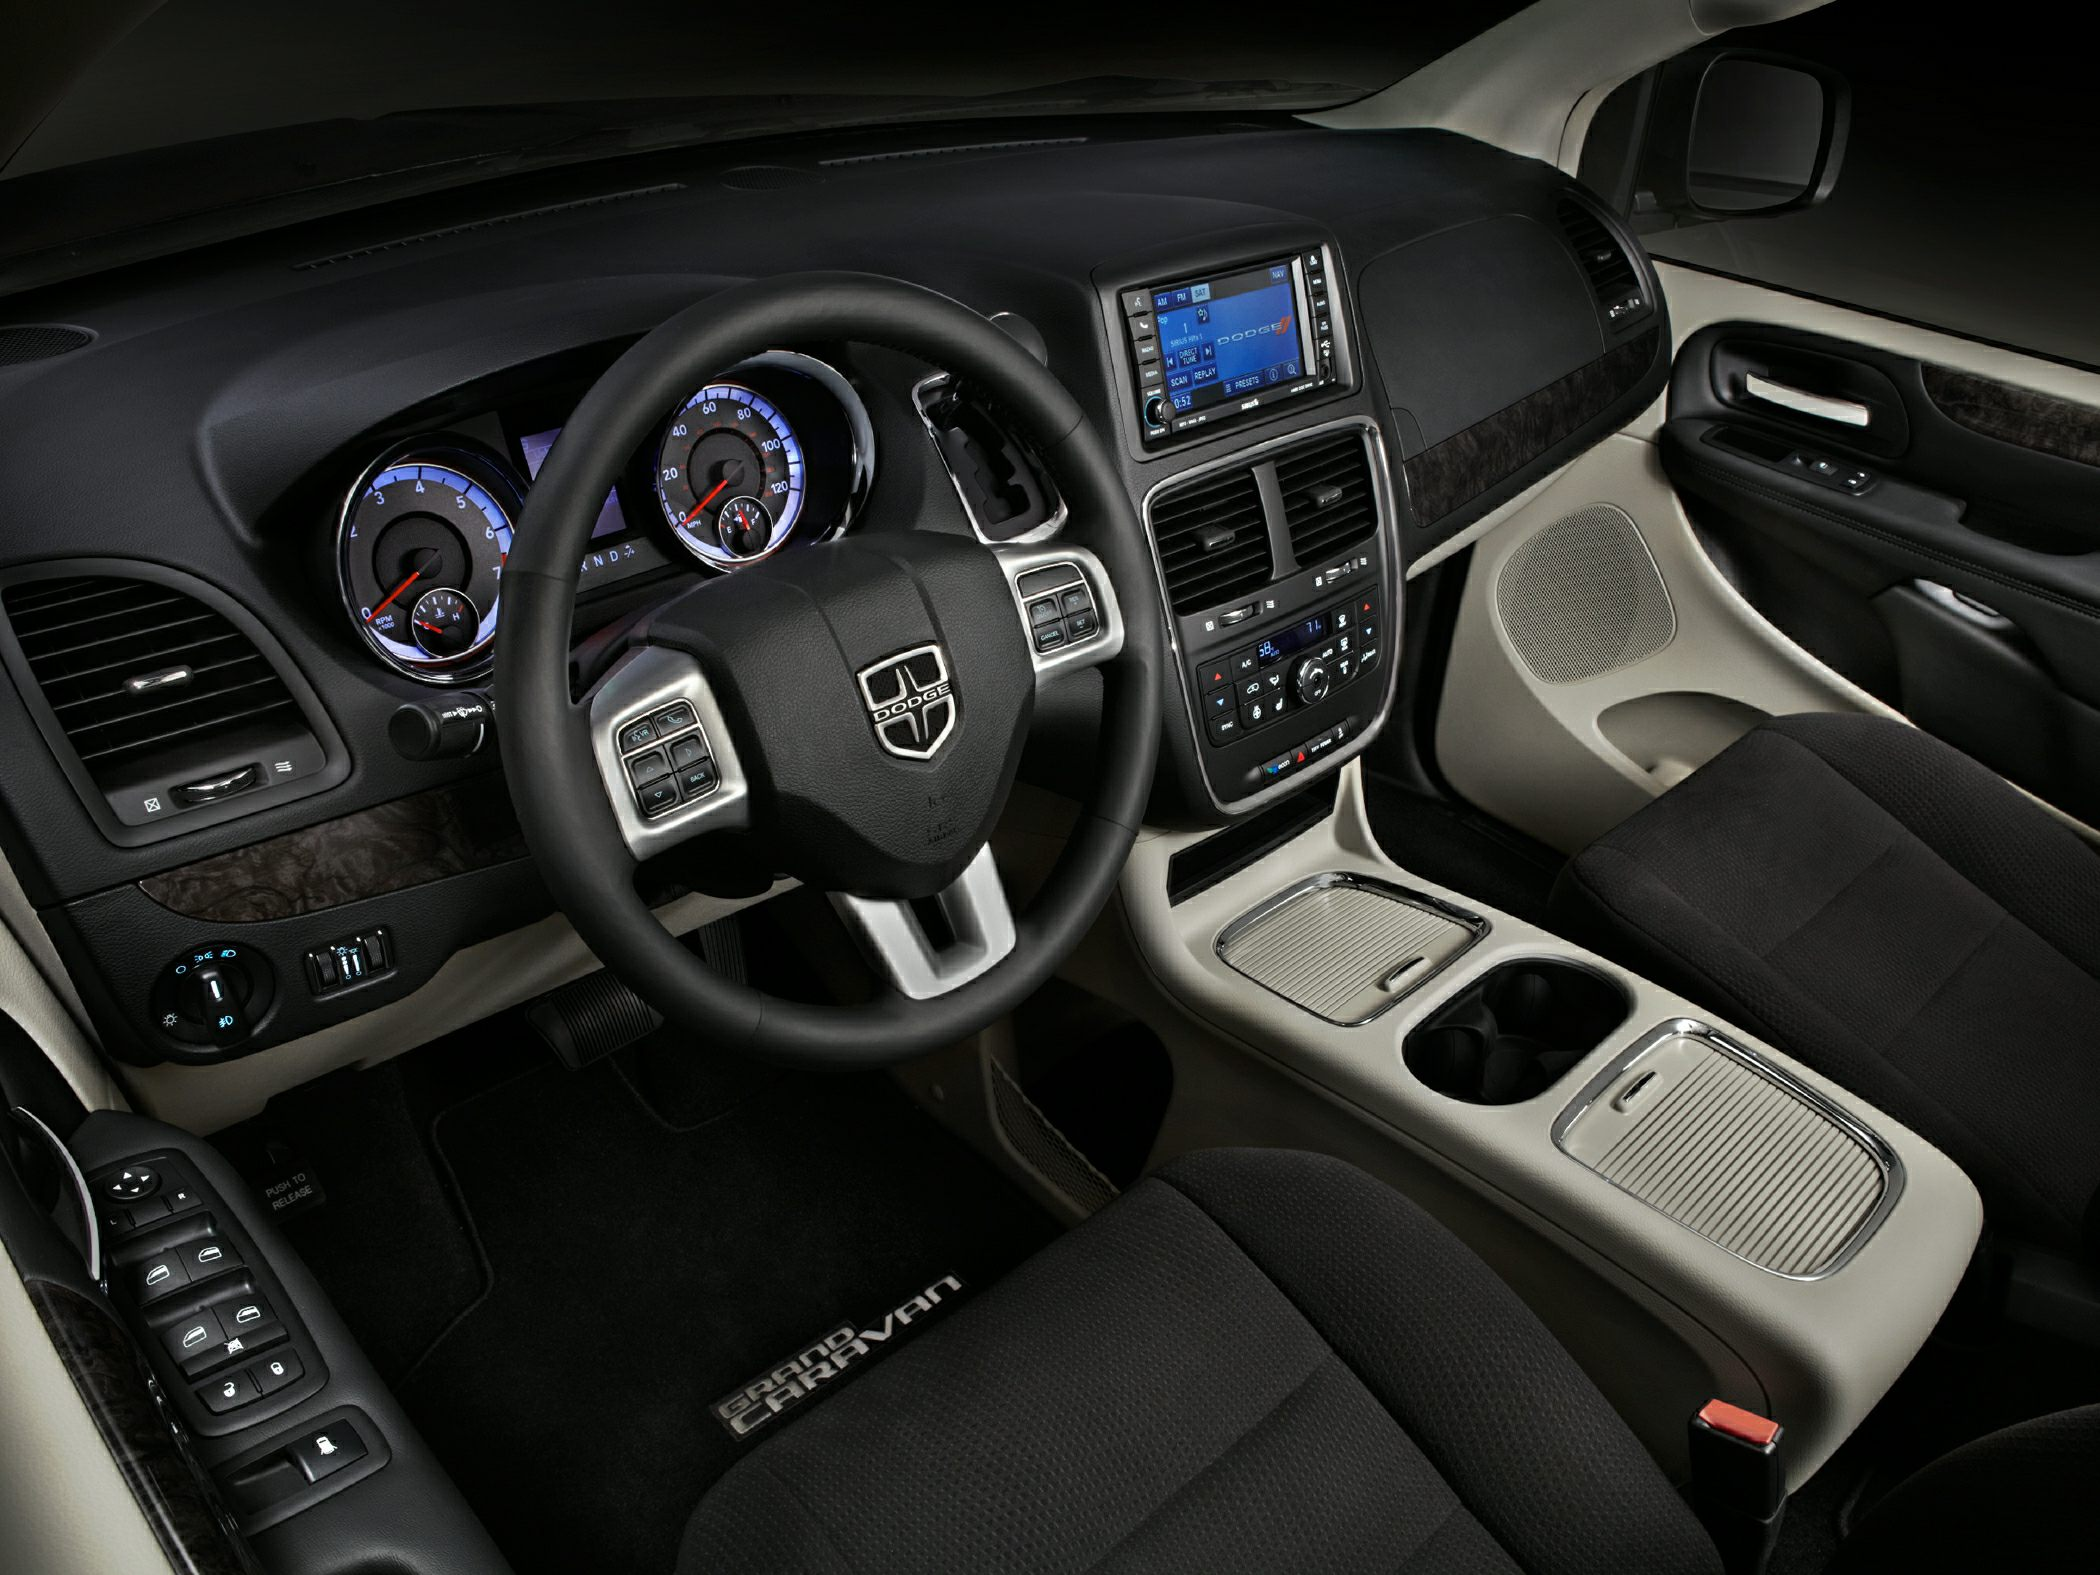 2017 Dodge Grand Caravan Deals Prices Incentives  Leases